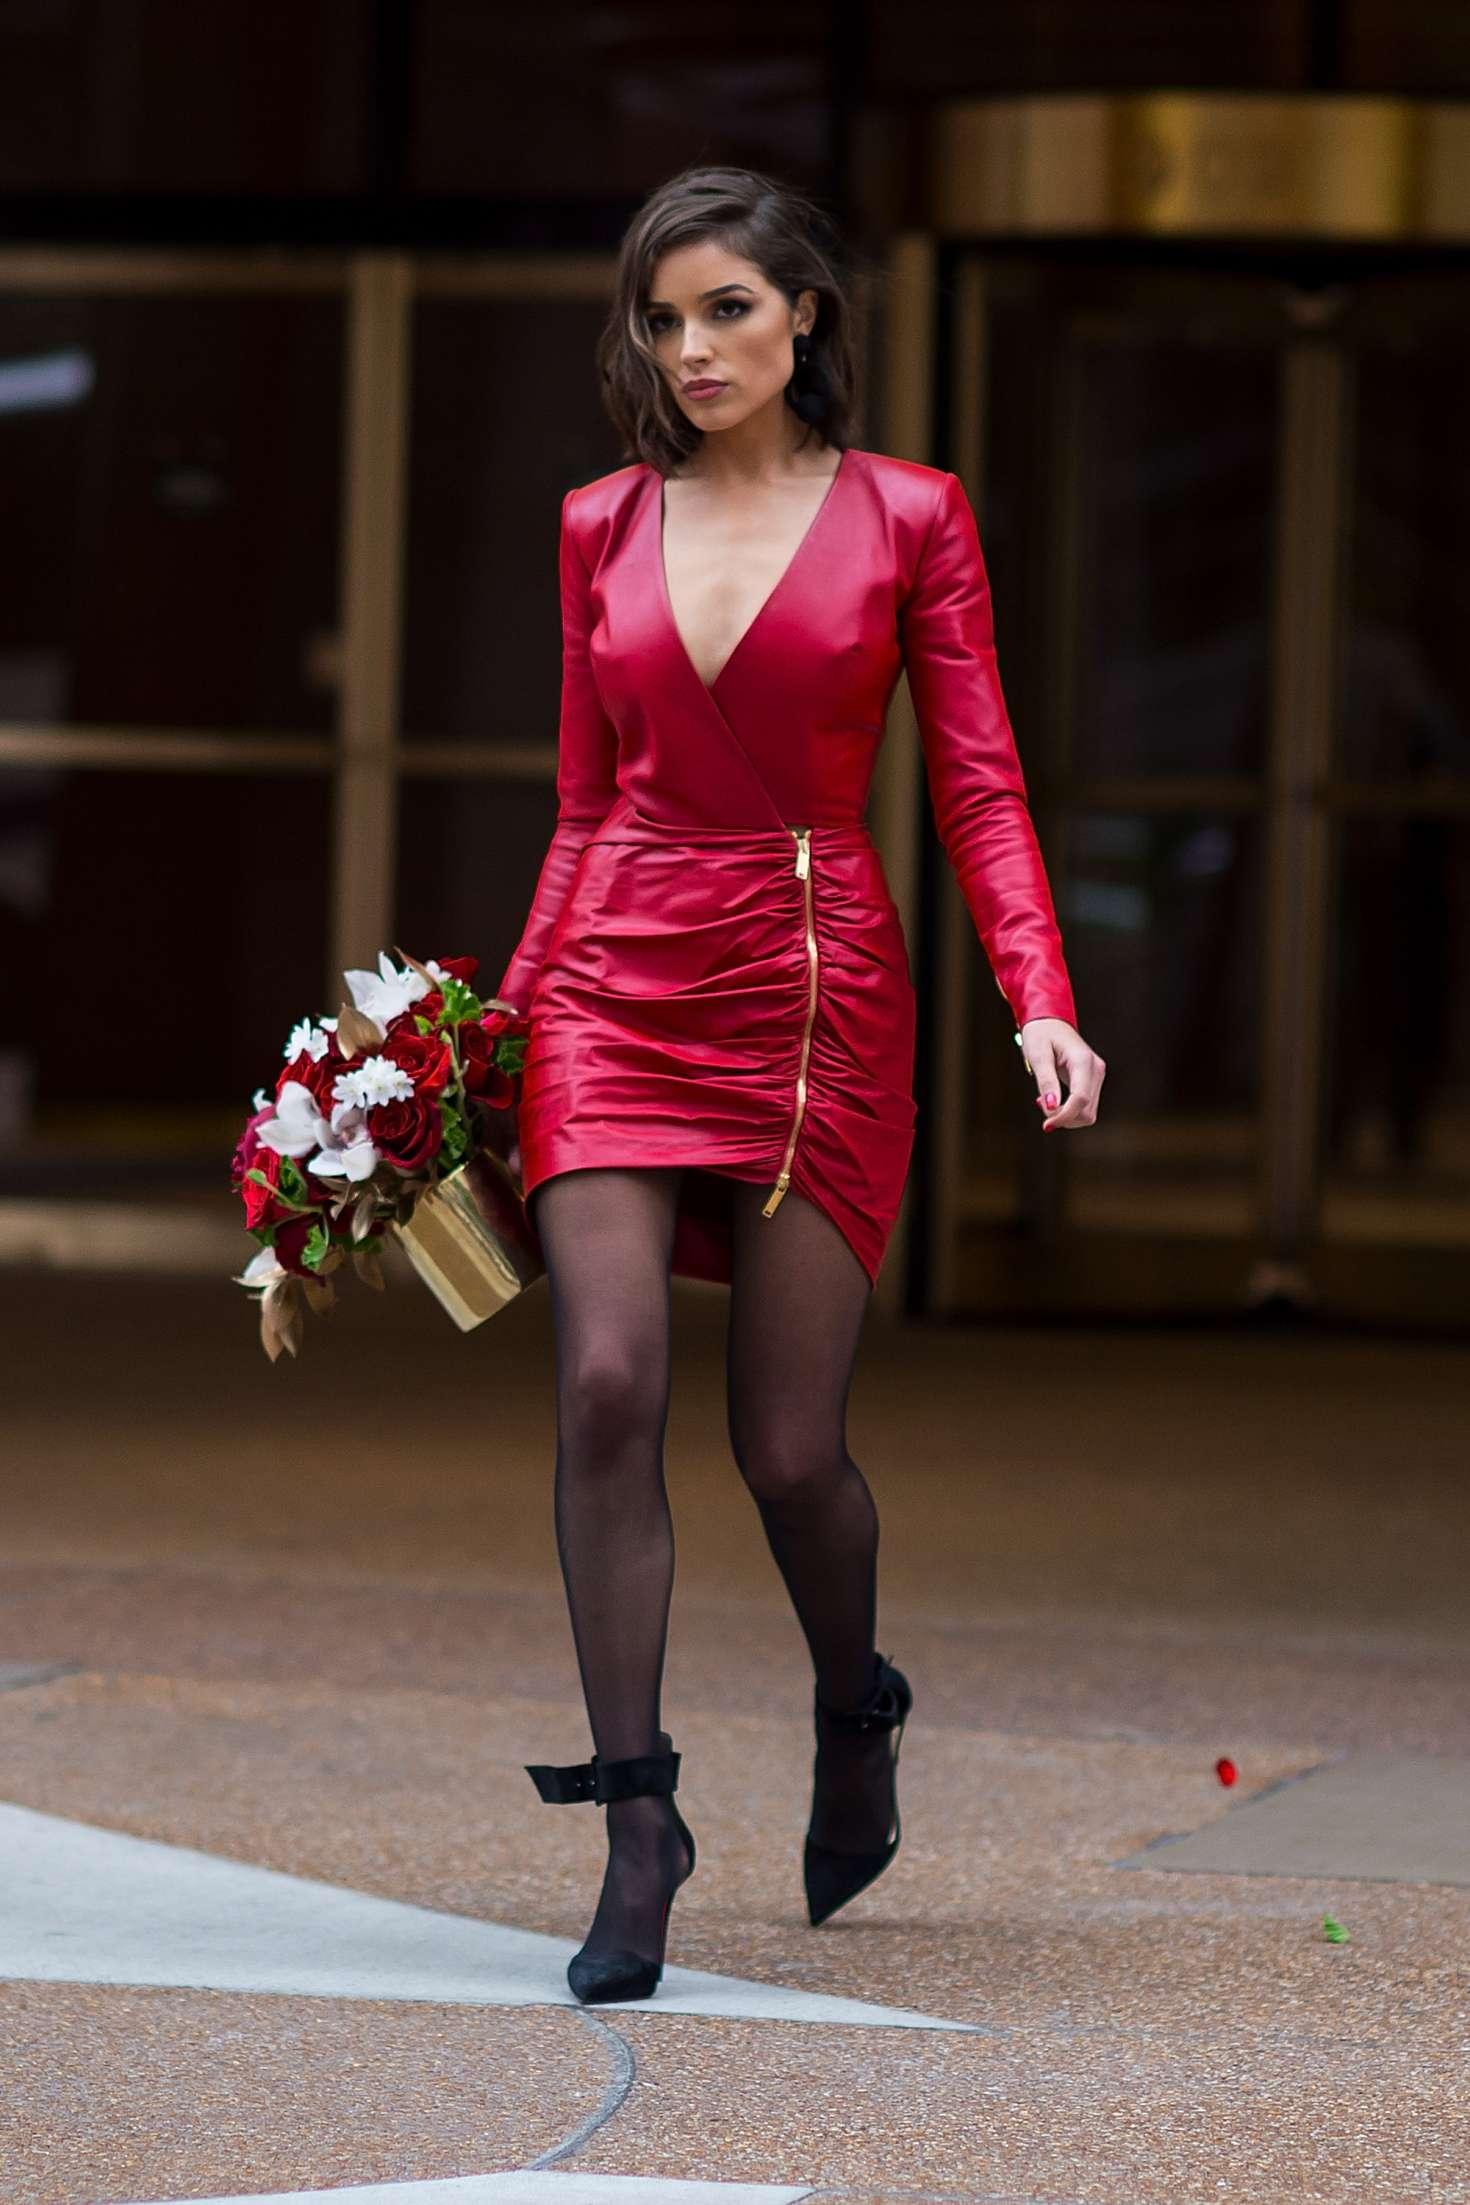 Olivia Culpo In Short Red Dress -01  Gotceleb-9434